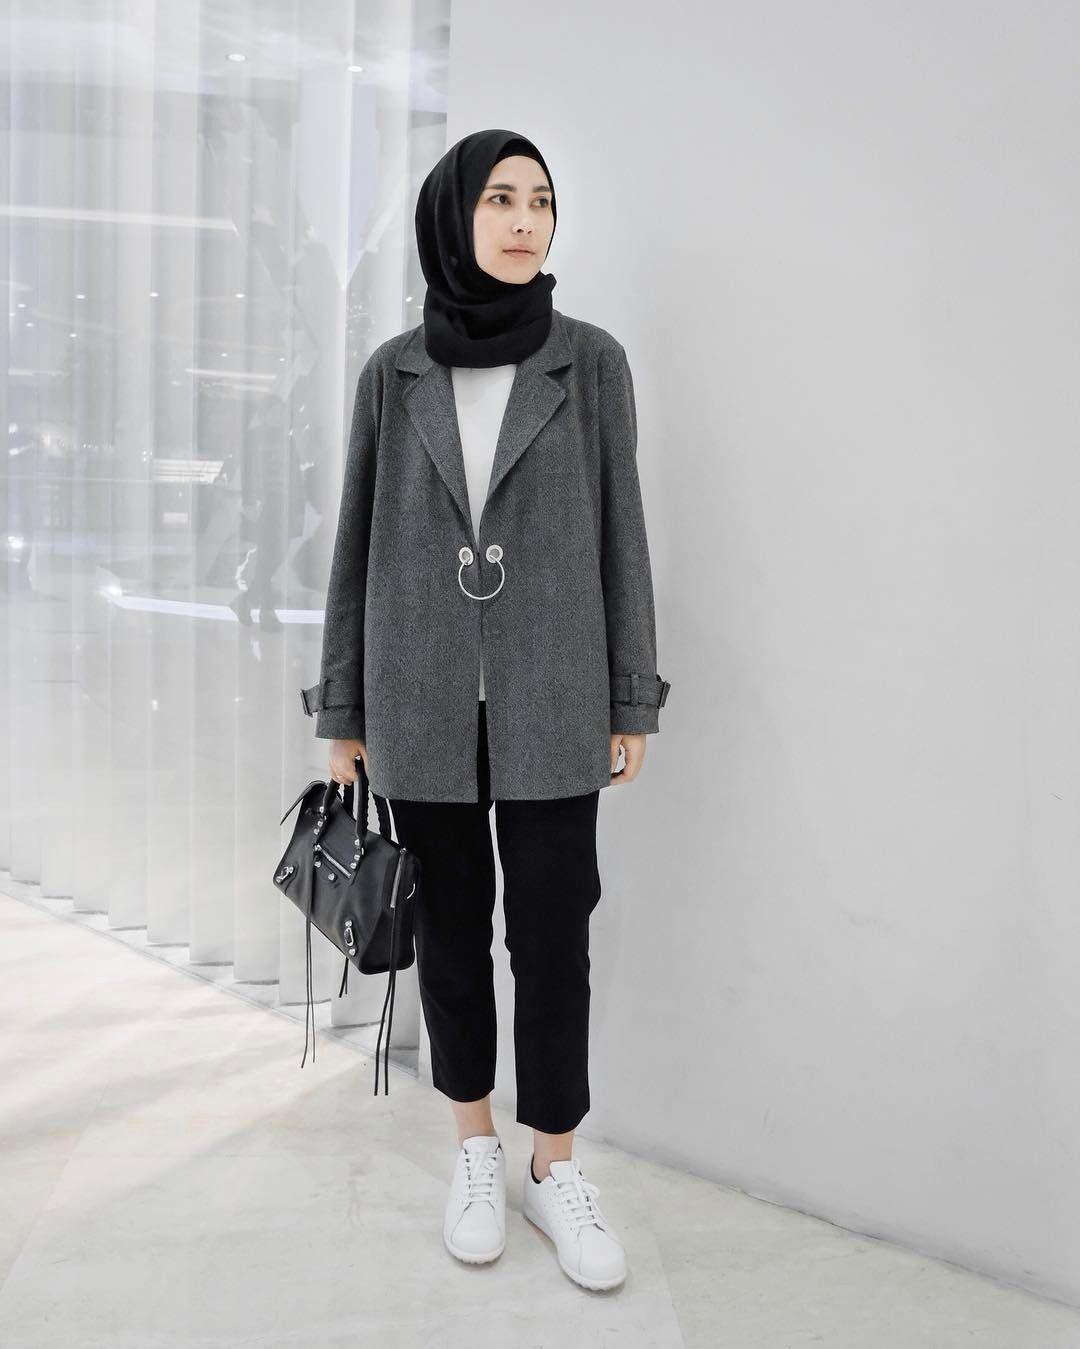 Pin By Terosha Reynanda On Hijabicasual In 2019 Pinterest